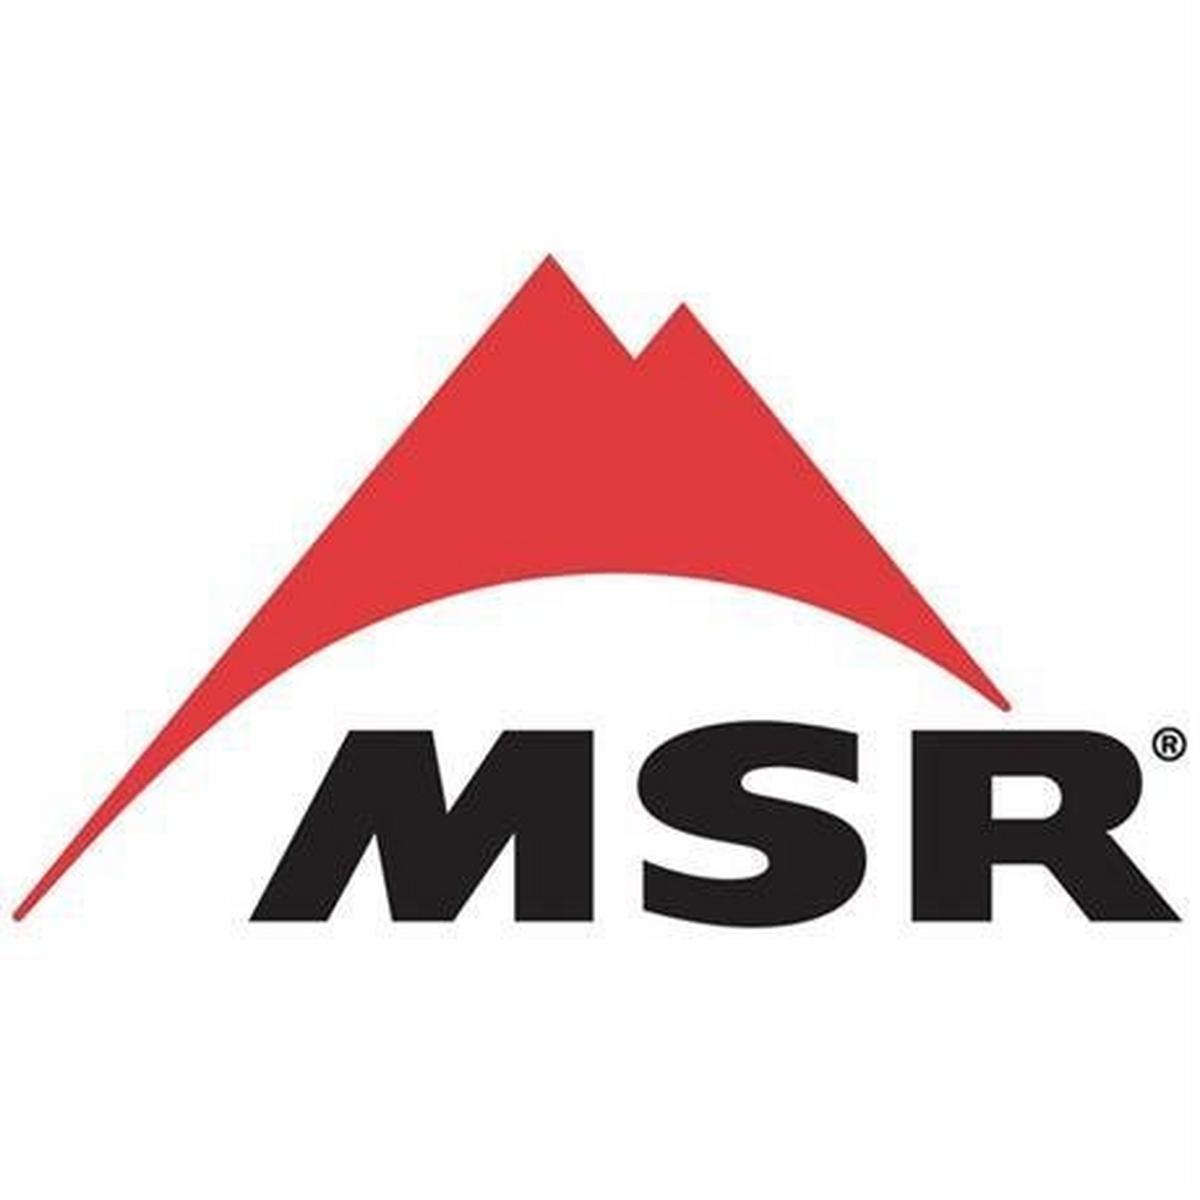 M.s.r. MSR Stove Spare/Accessory: Child-Resistant Fuel Bottle Safety Cap